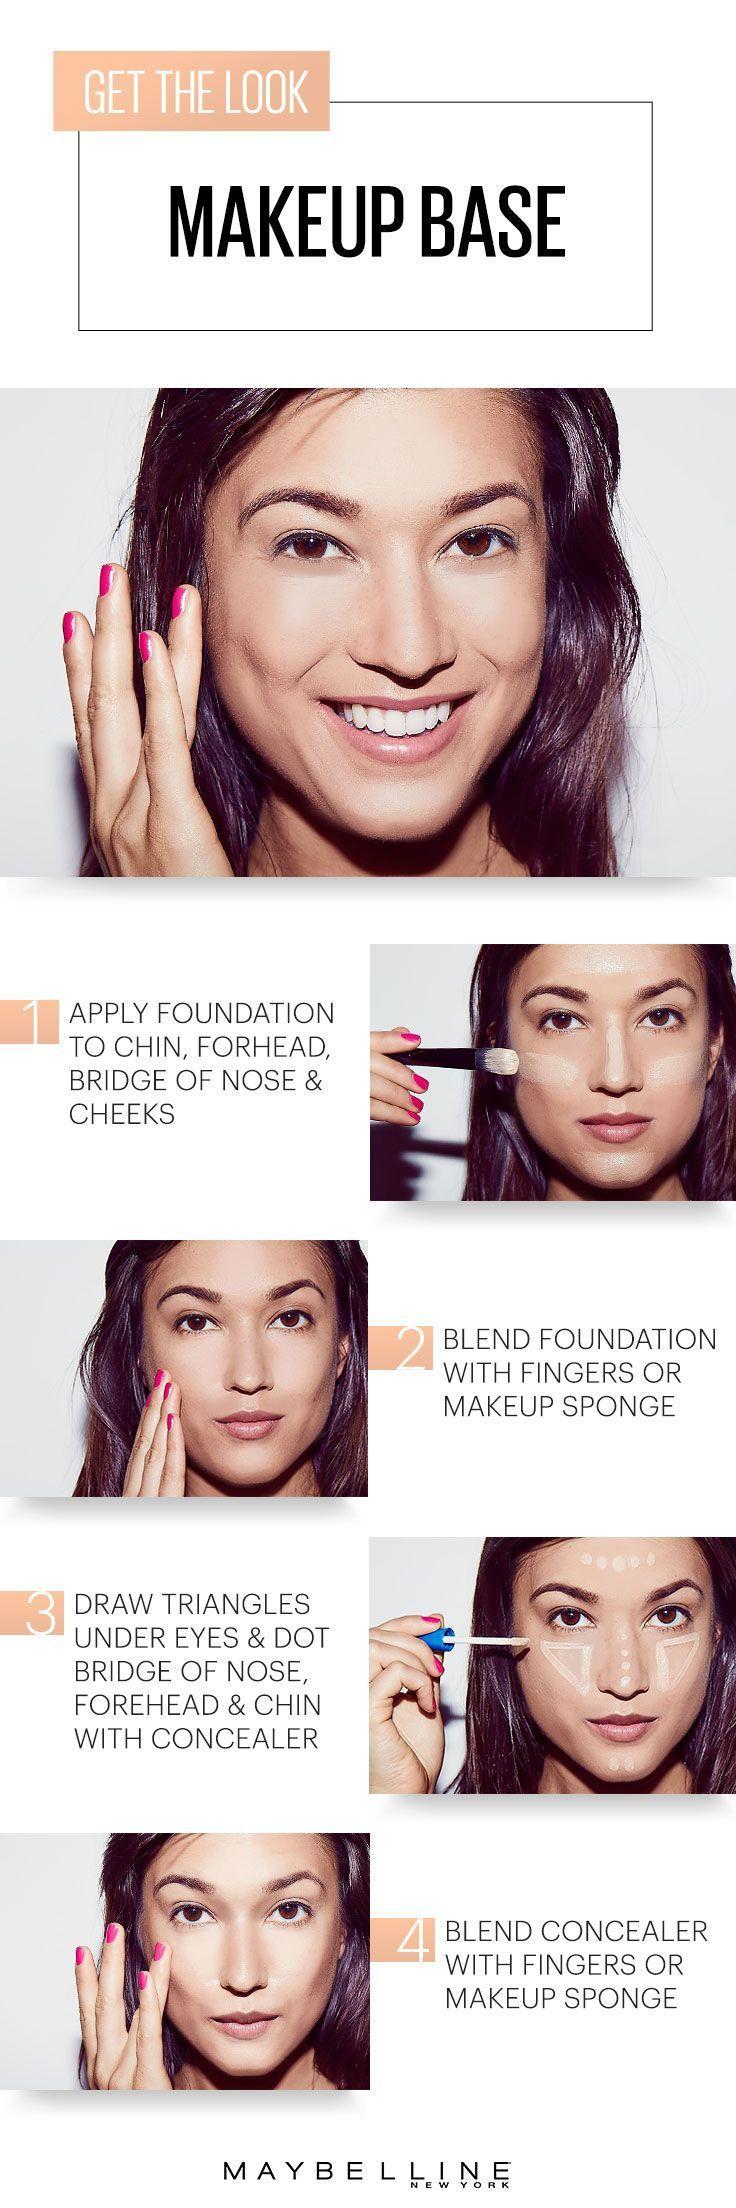 Spring Makeup Tip Apply Foundation First Then Concealer It